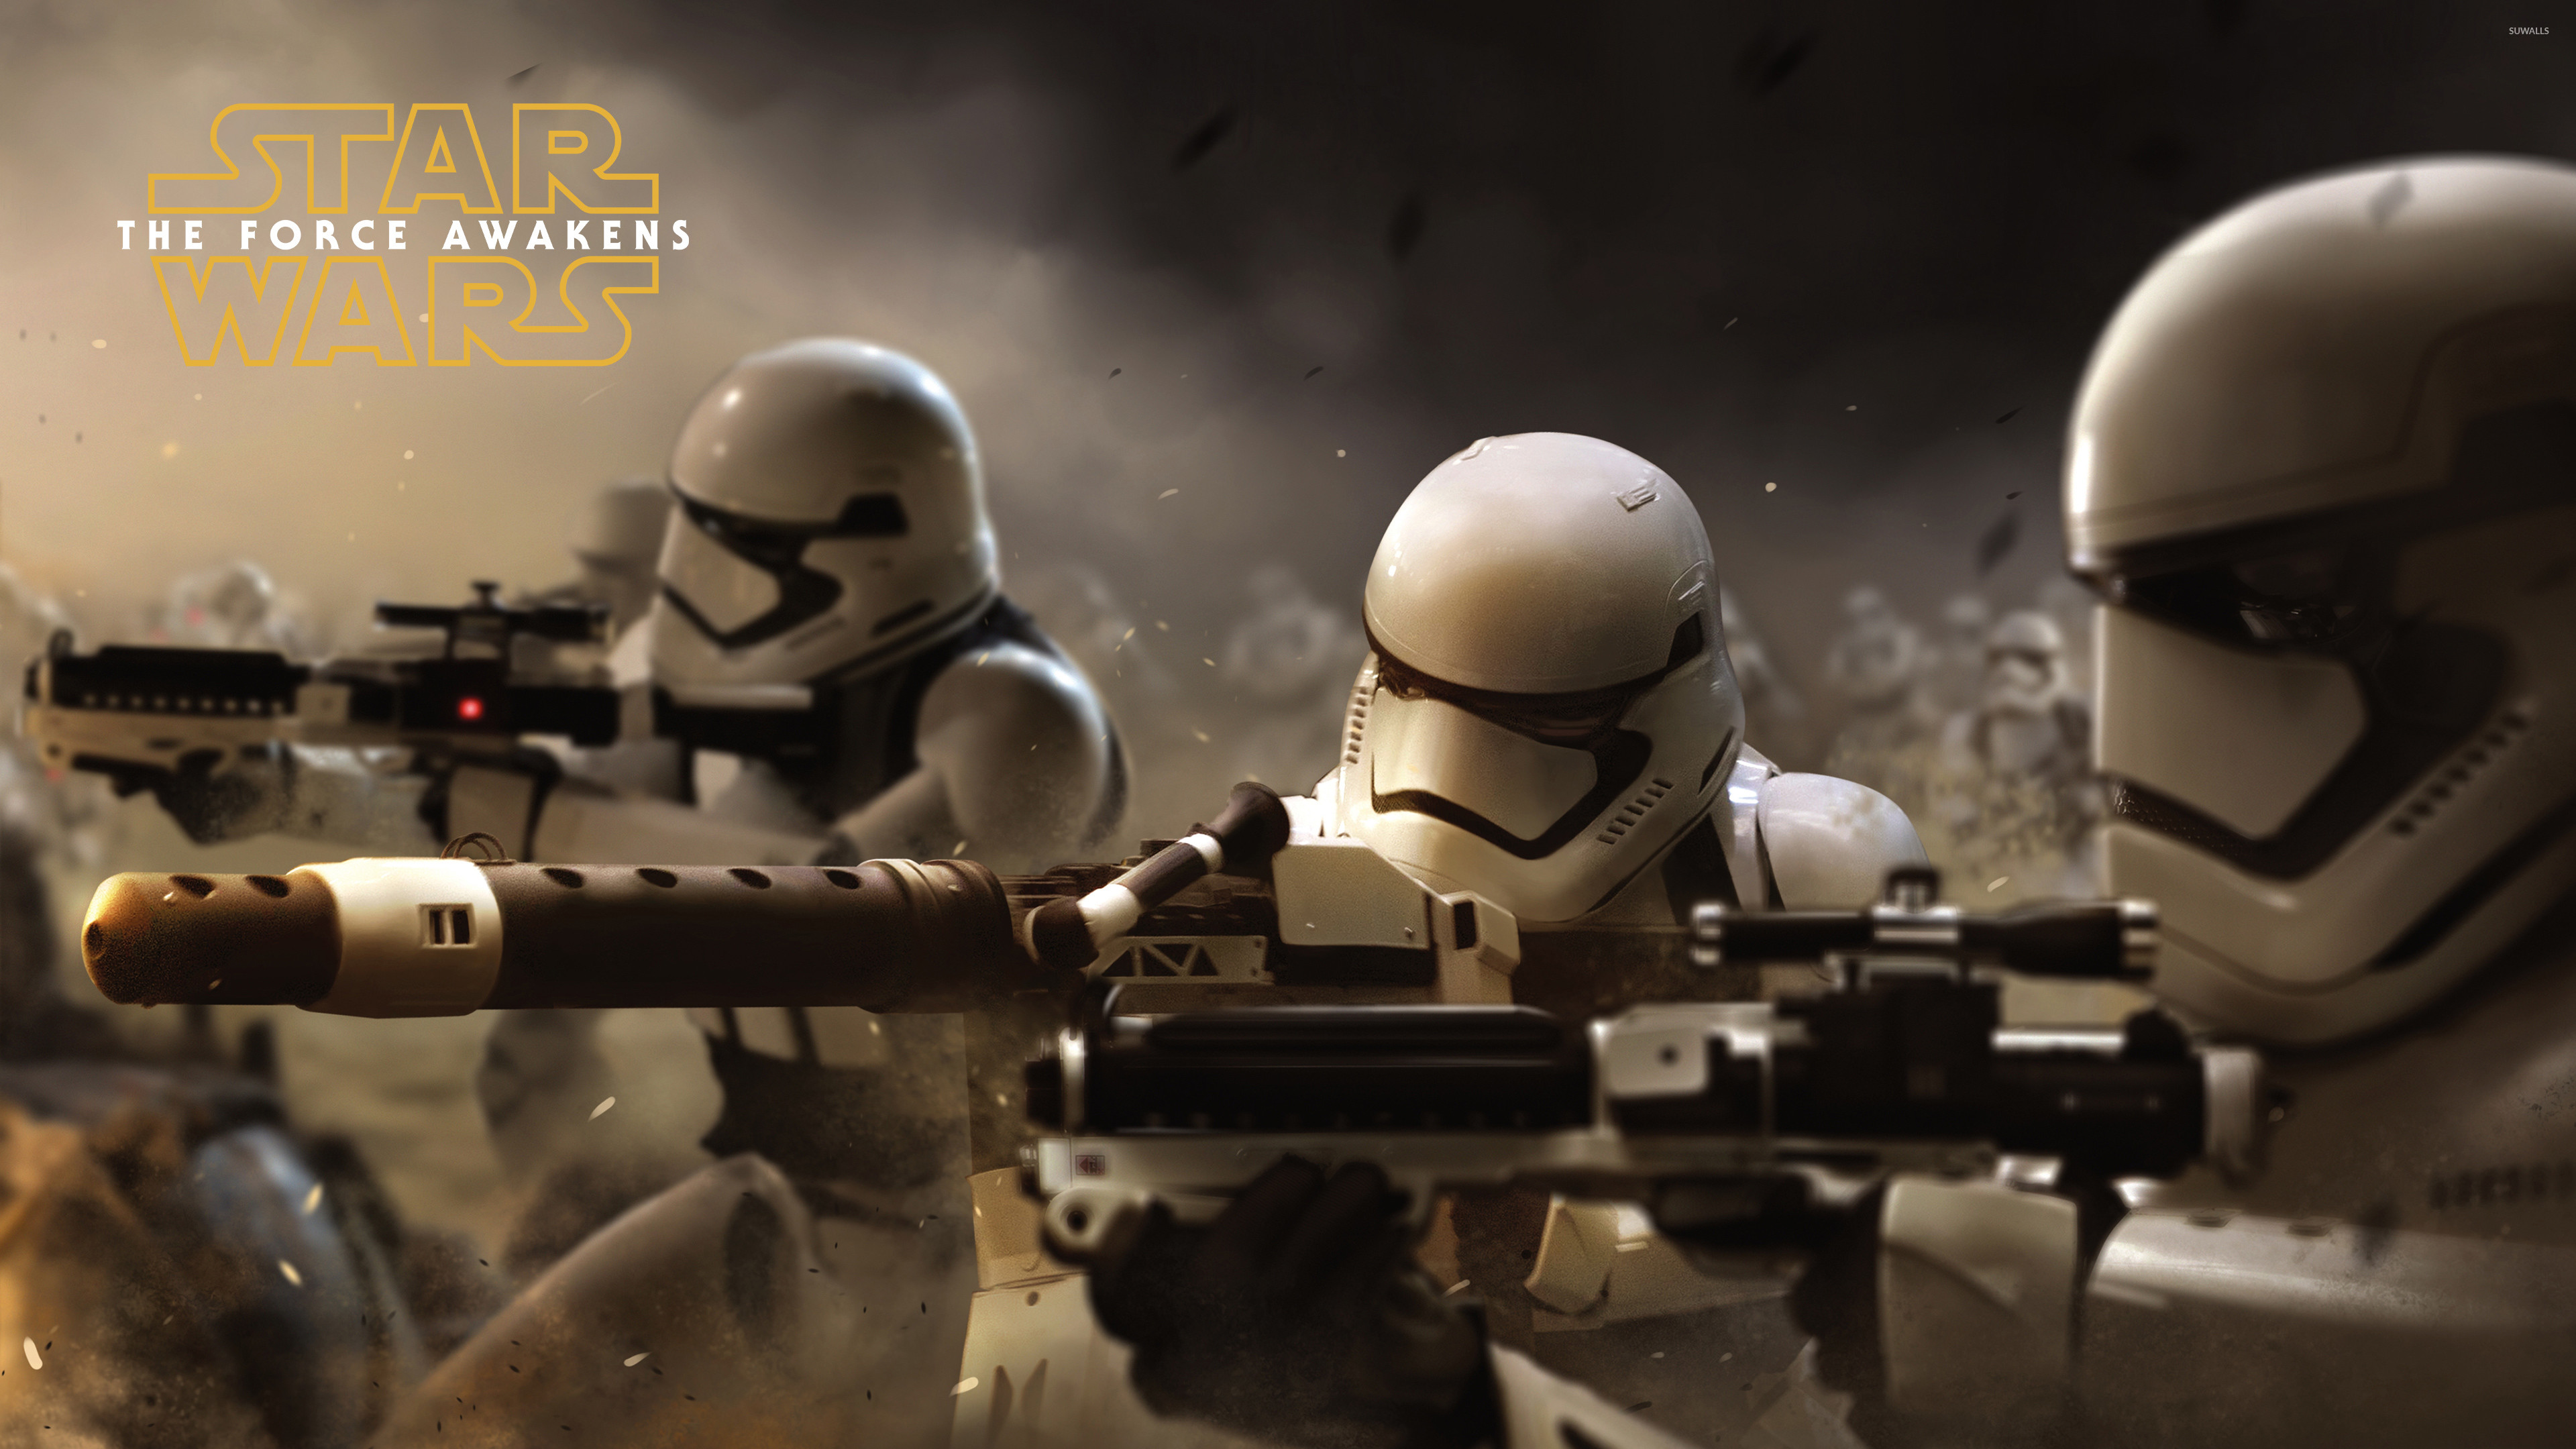 Stormtroopers in Star Wars: The Force Awakens wallpaper